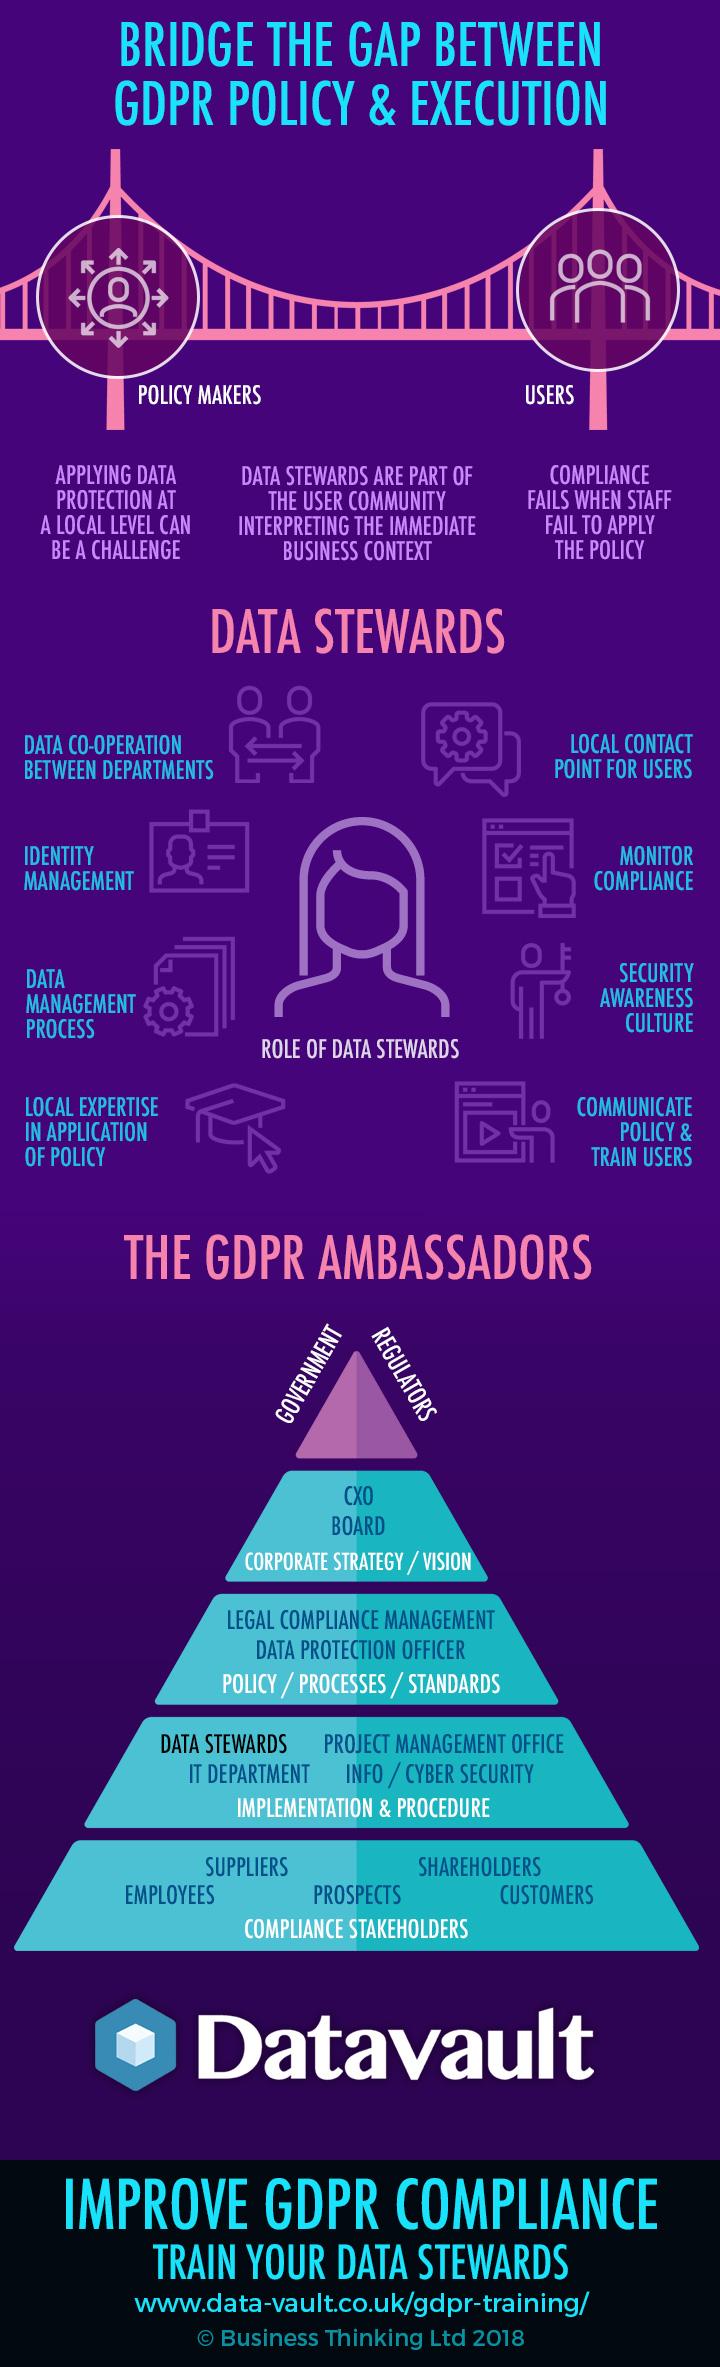 Data Stewards GDPR Ambassadors Infographic